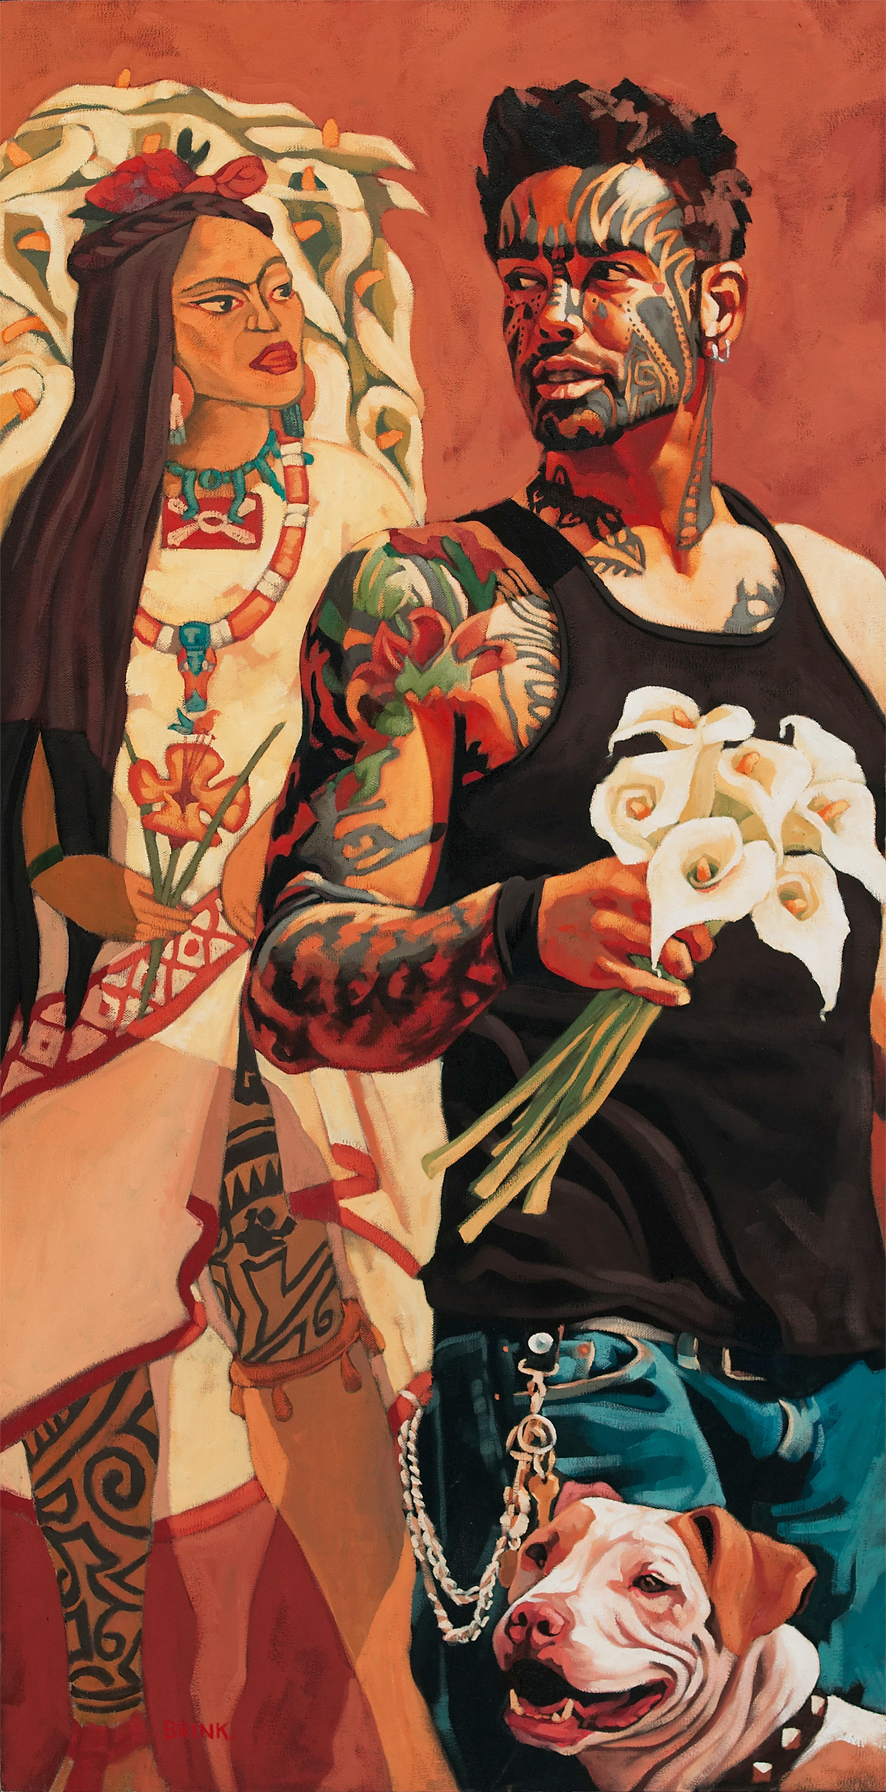 Para Tu Diego, 40 x 20 in, oil on canvas, 2004